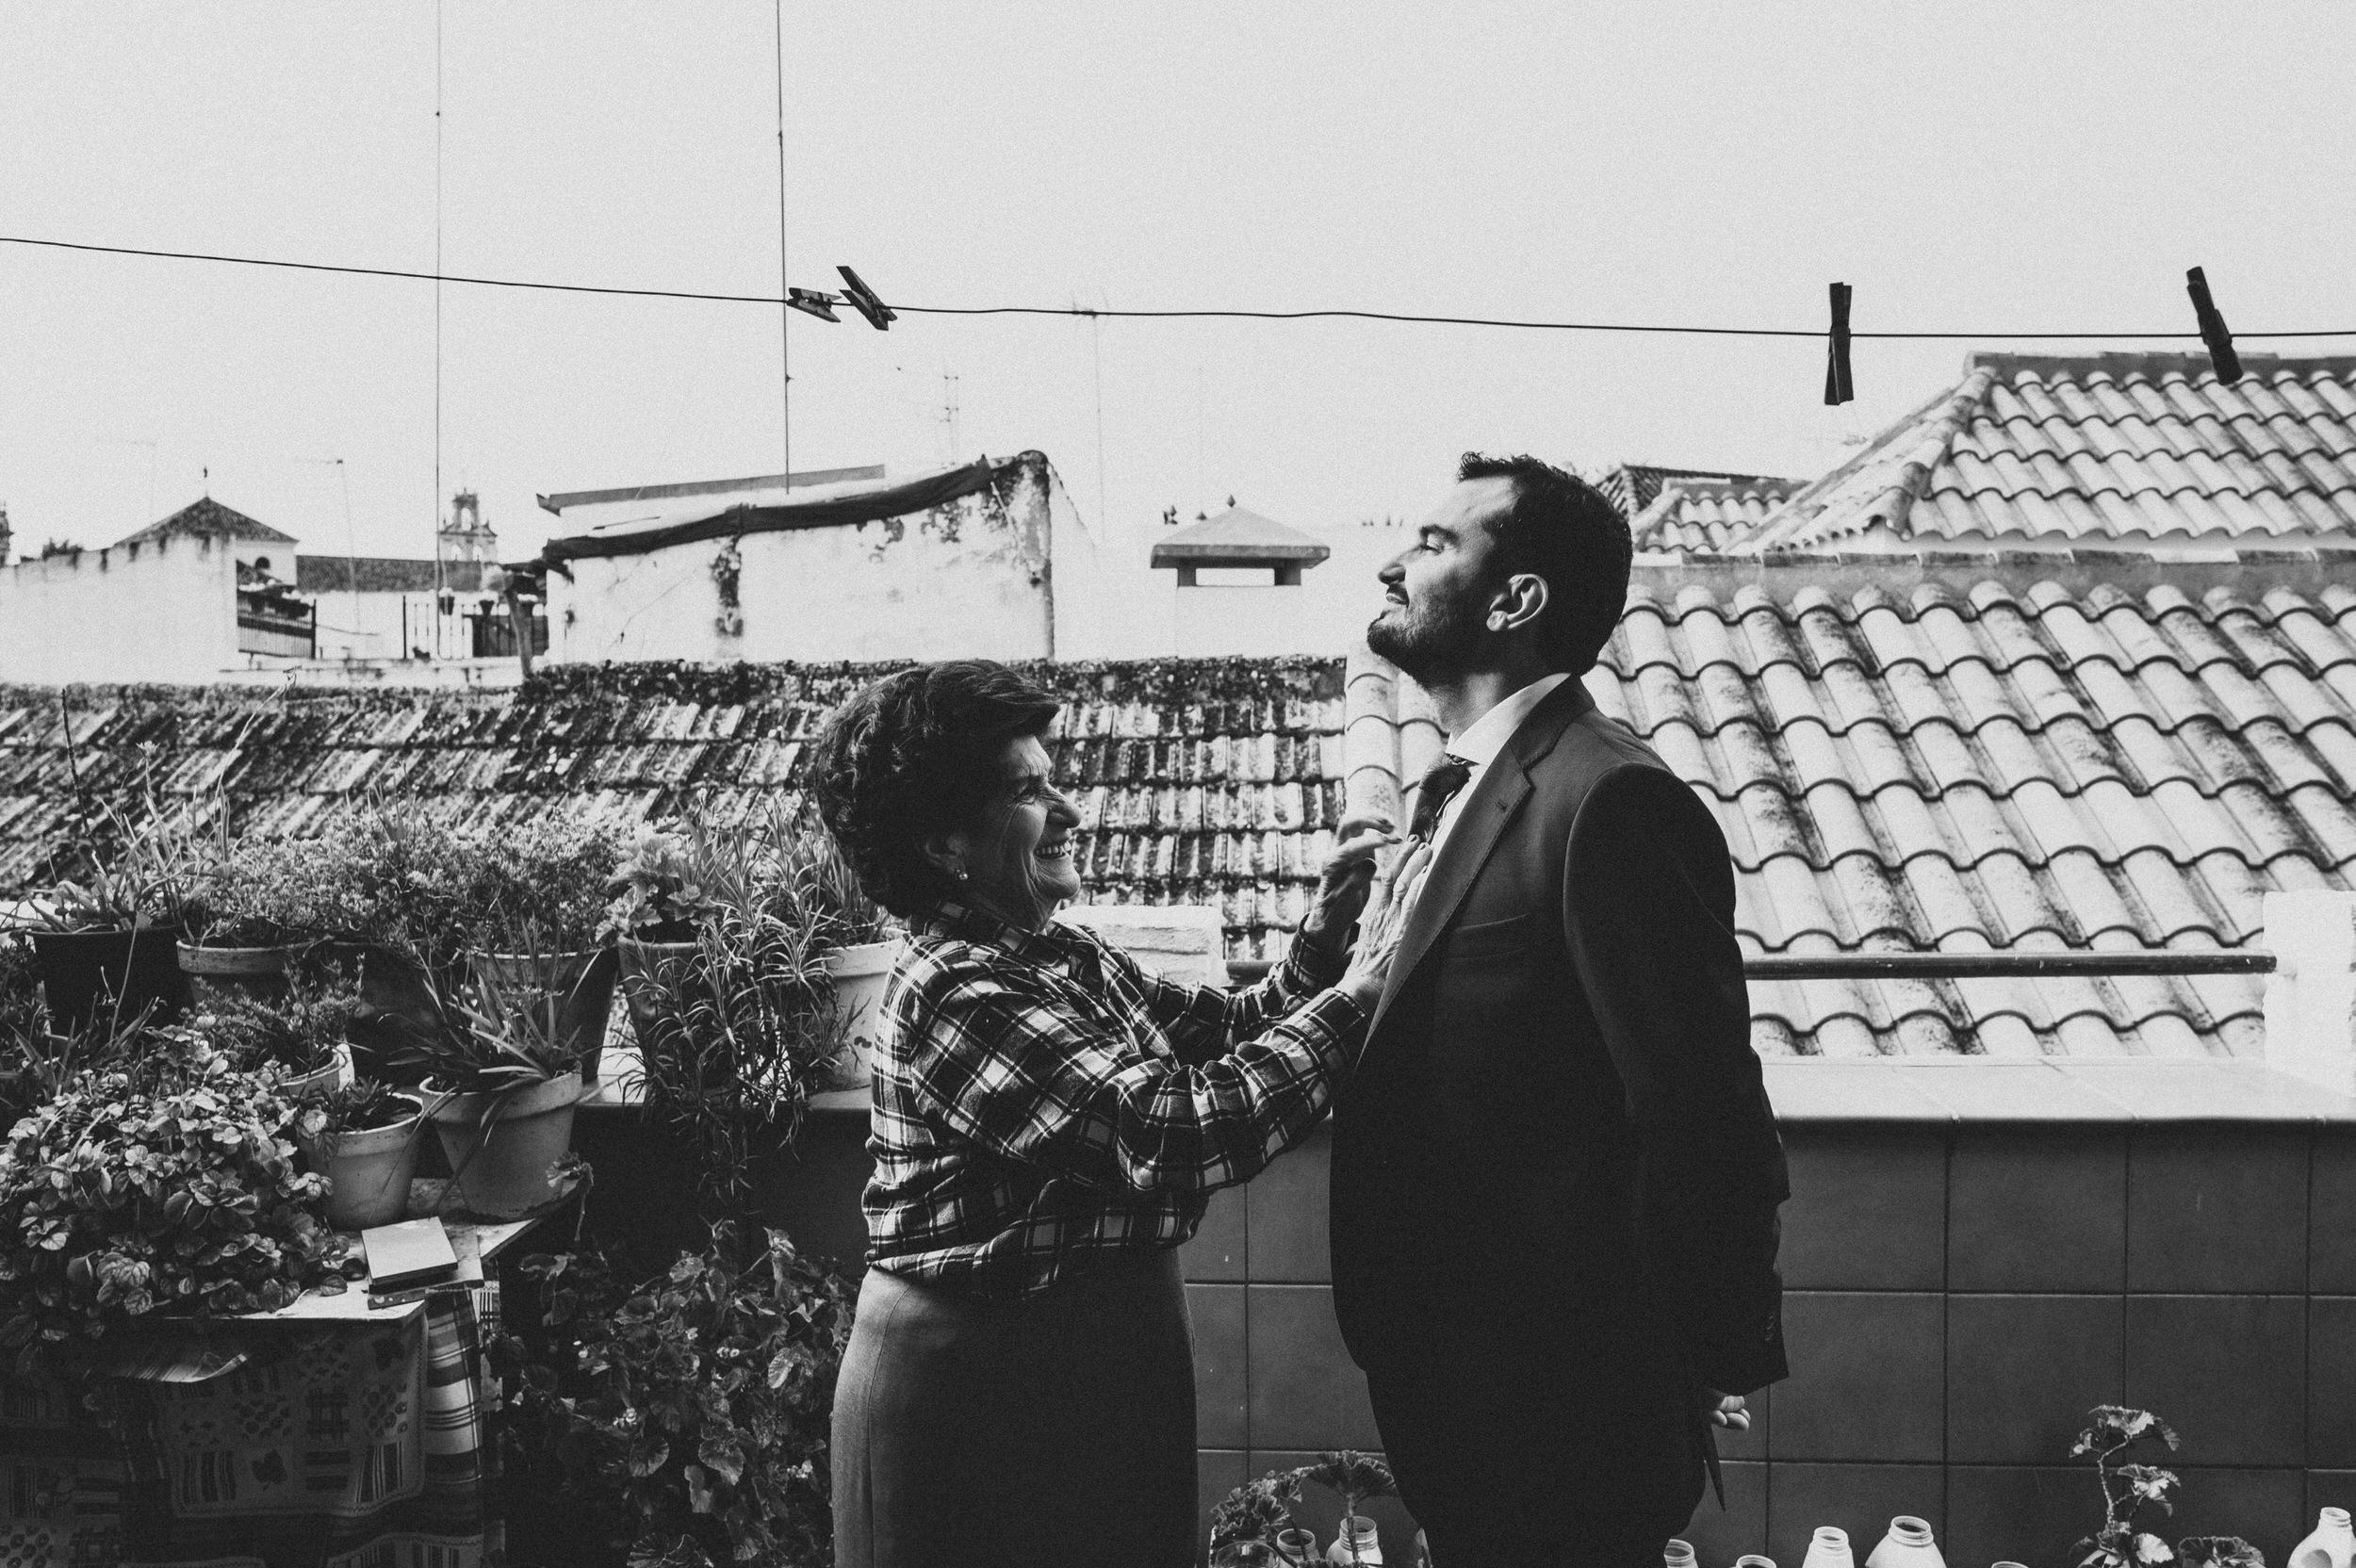 Cristina & Jero - Boda en Ecija - Iglesia Santa Ana - Fotógrafo Andrés Amarillo (4).JPG